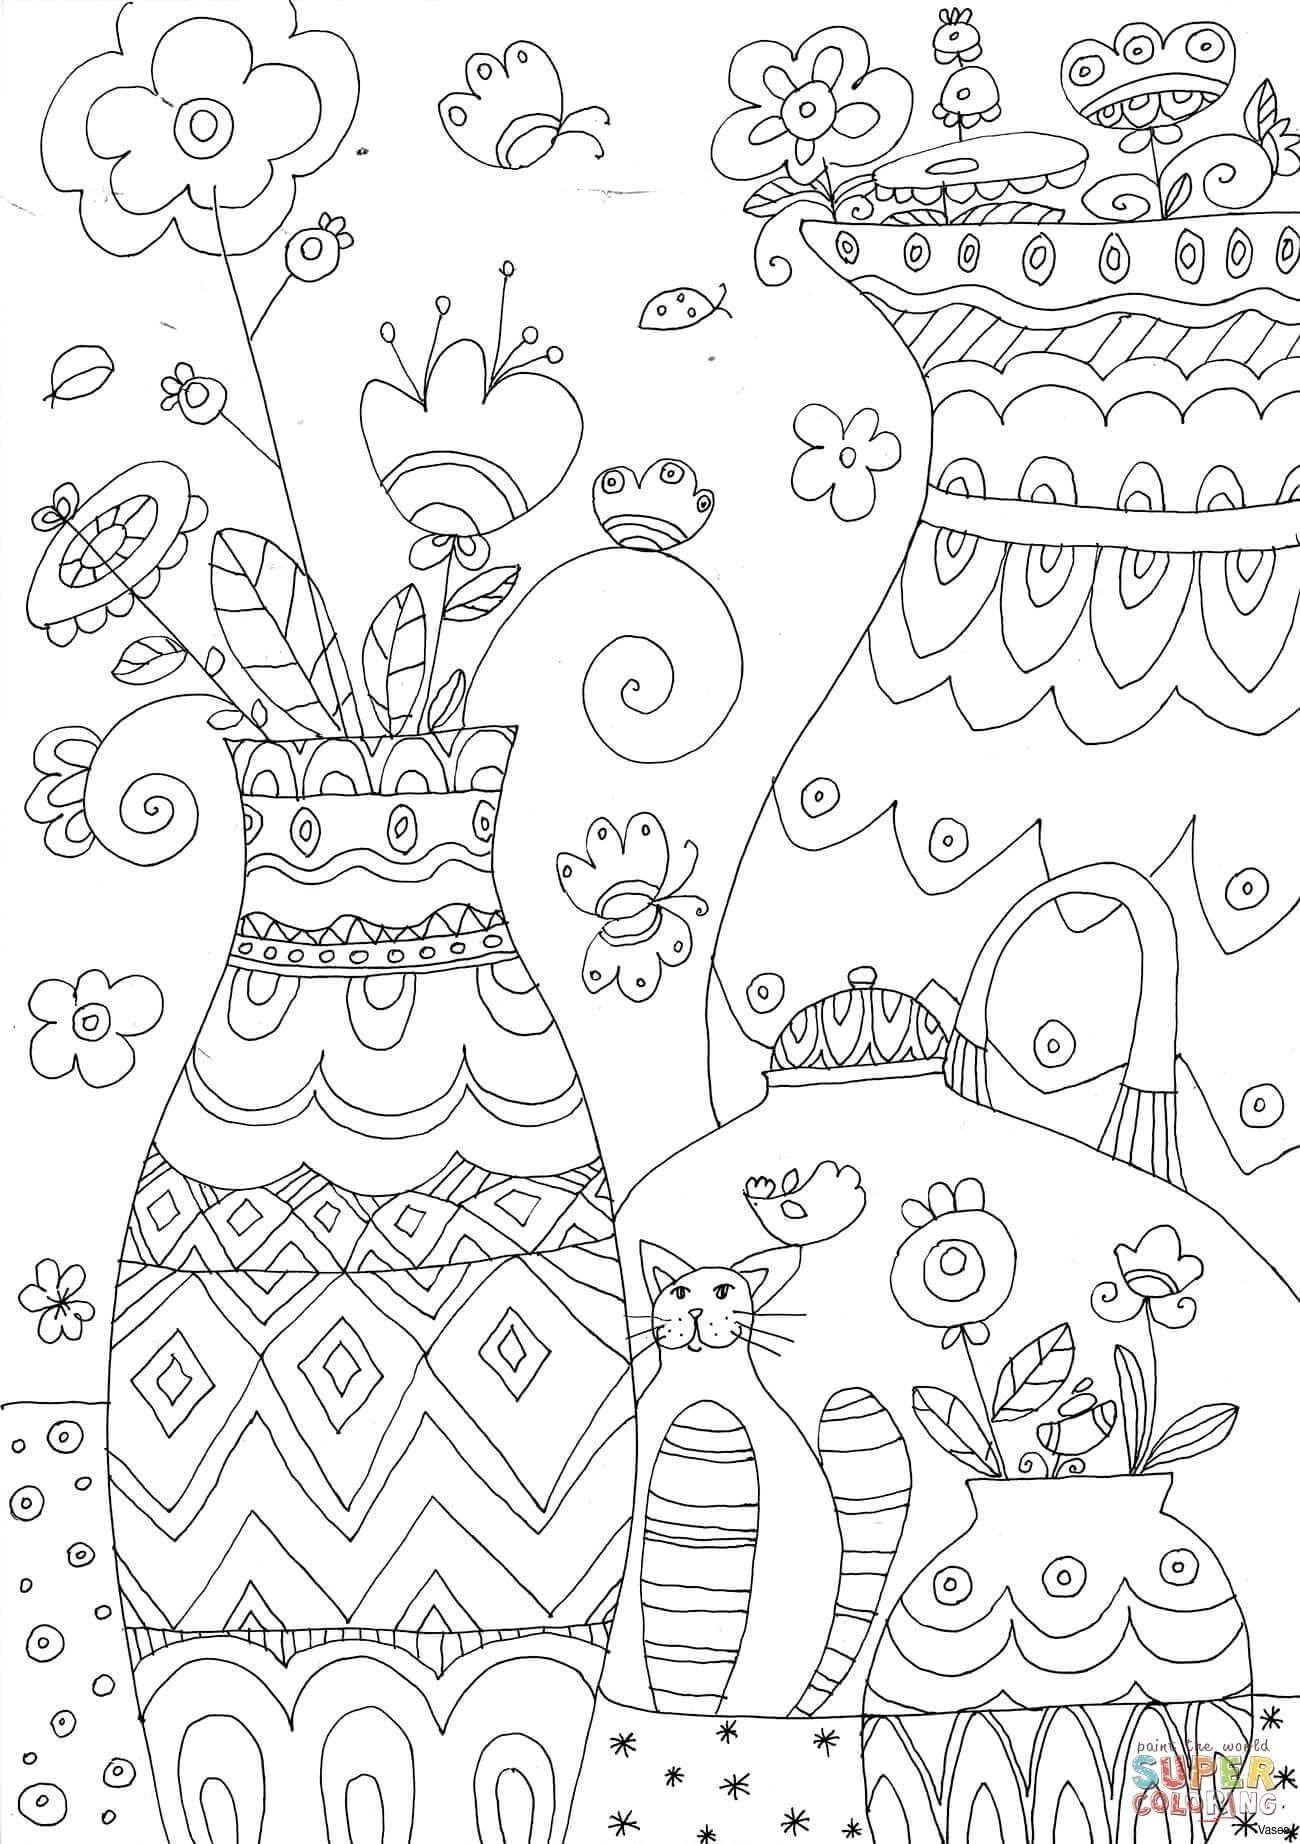 Nick Jr Coloring Pages Printable Best Of Printable